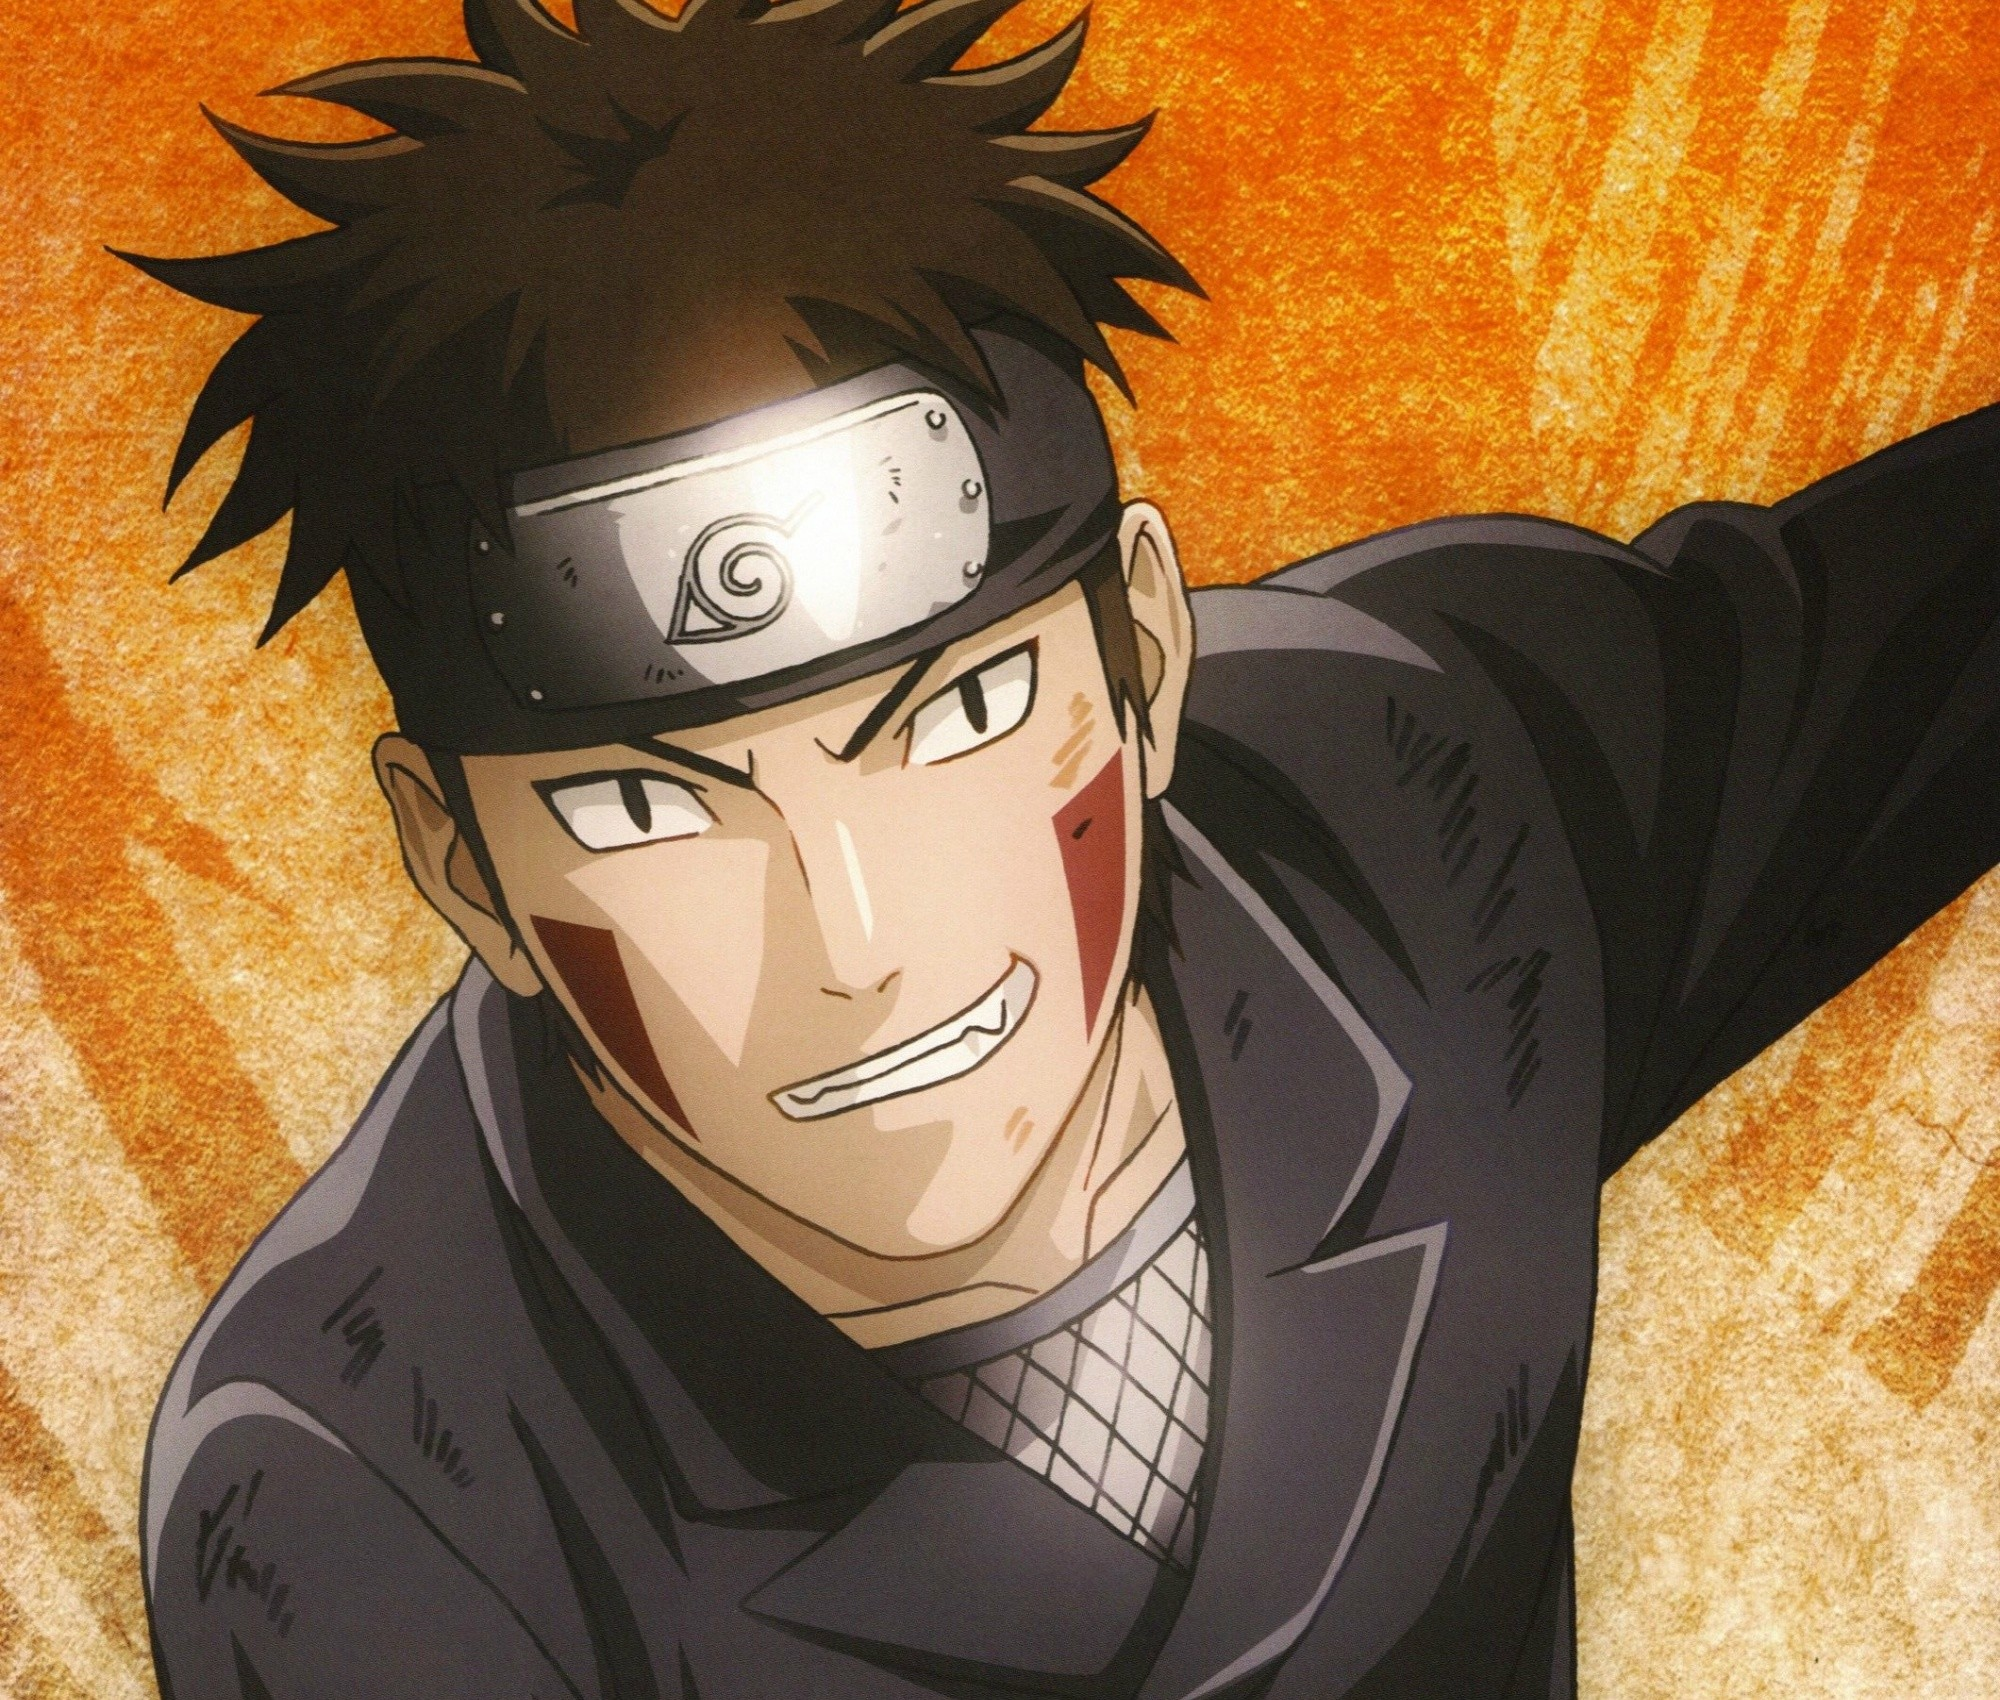 Res: 2000x1700, Anime - Naruto Kiba Inuzuka Wallpaper